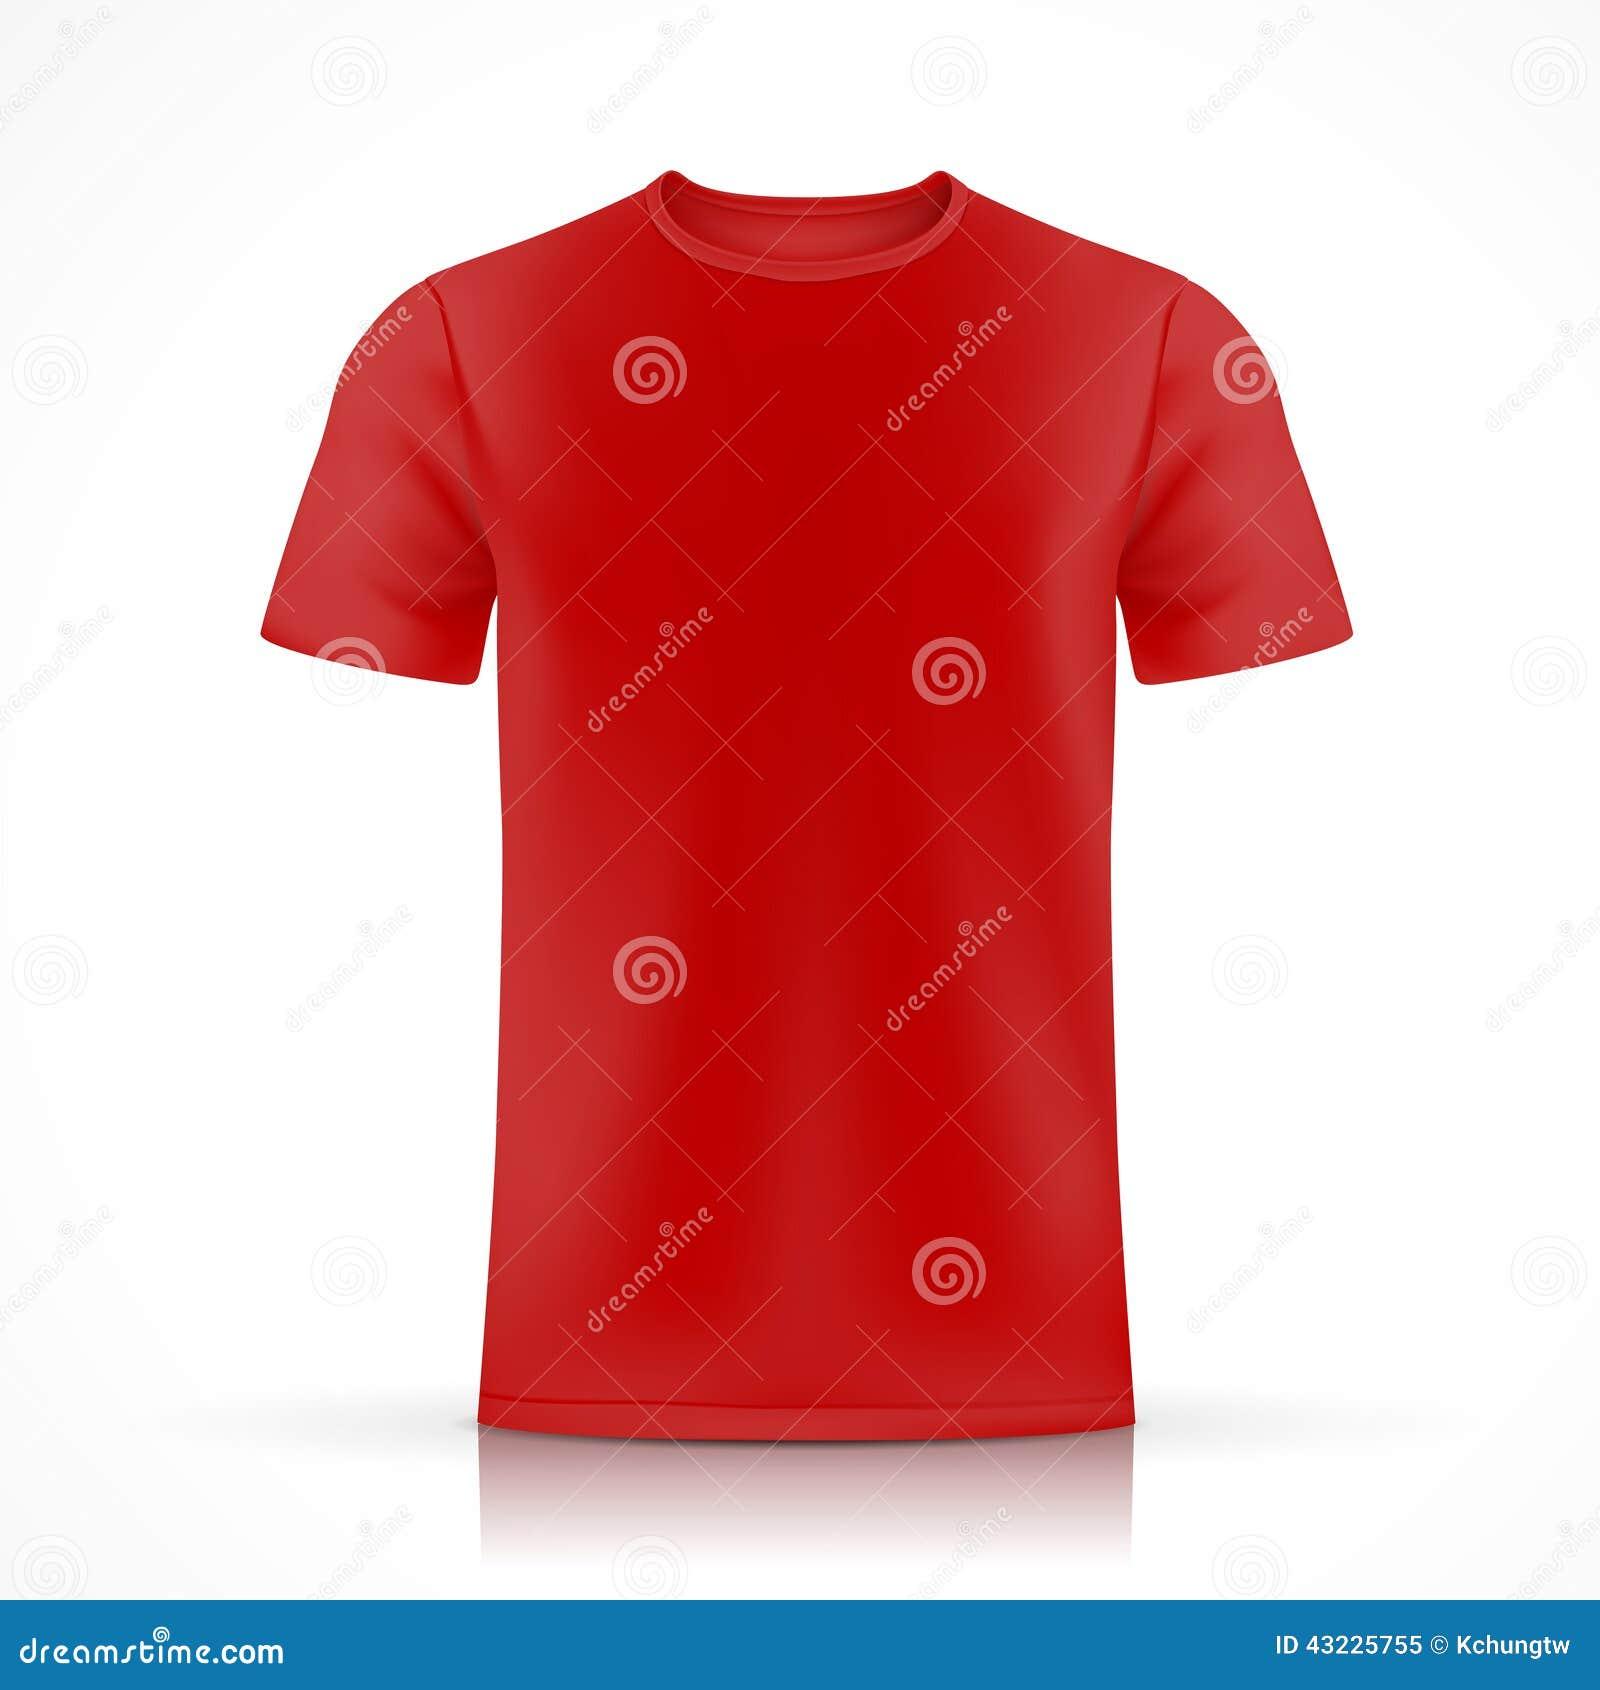 red t shirt template. Black Bedroom Furniture Sets. Home Design Ideas